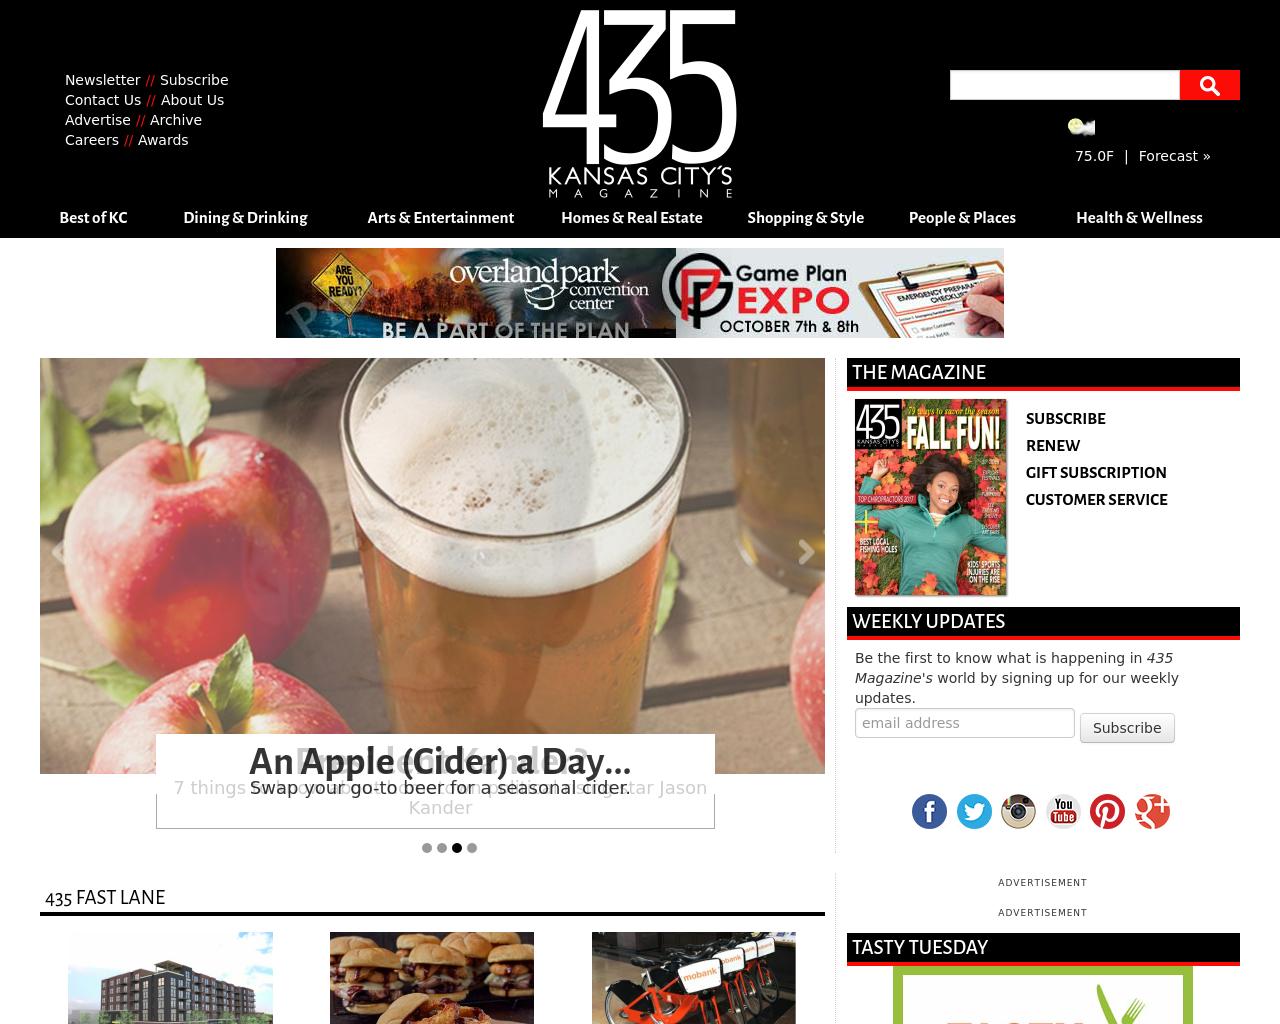 435-Advertising-Reviews-Pricing